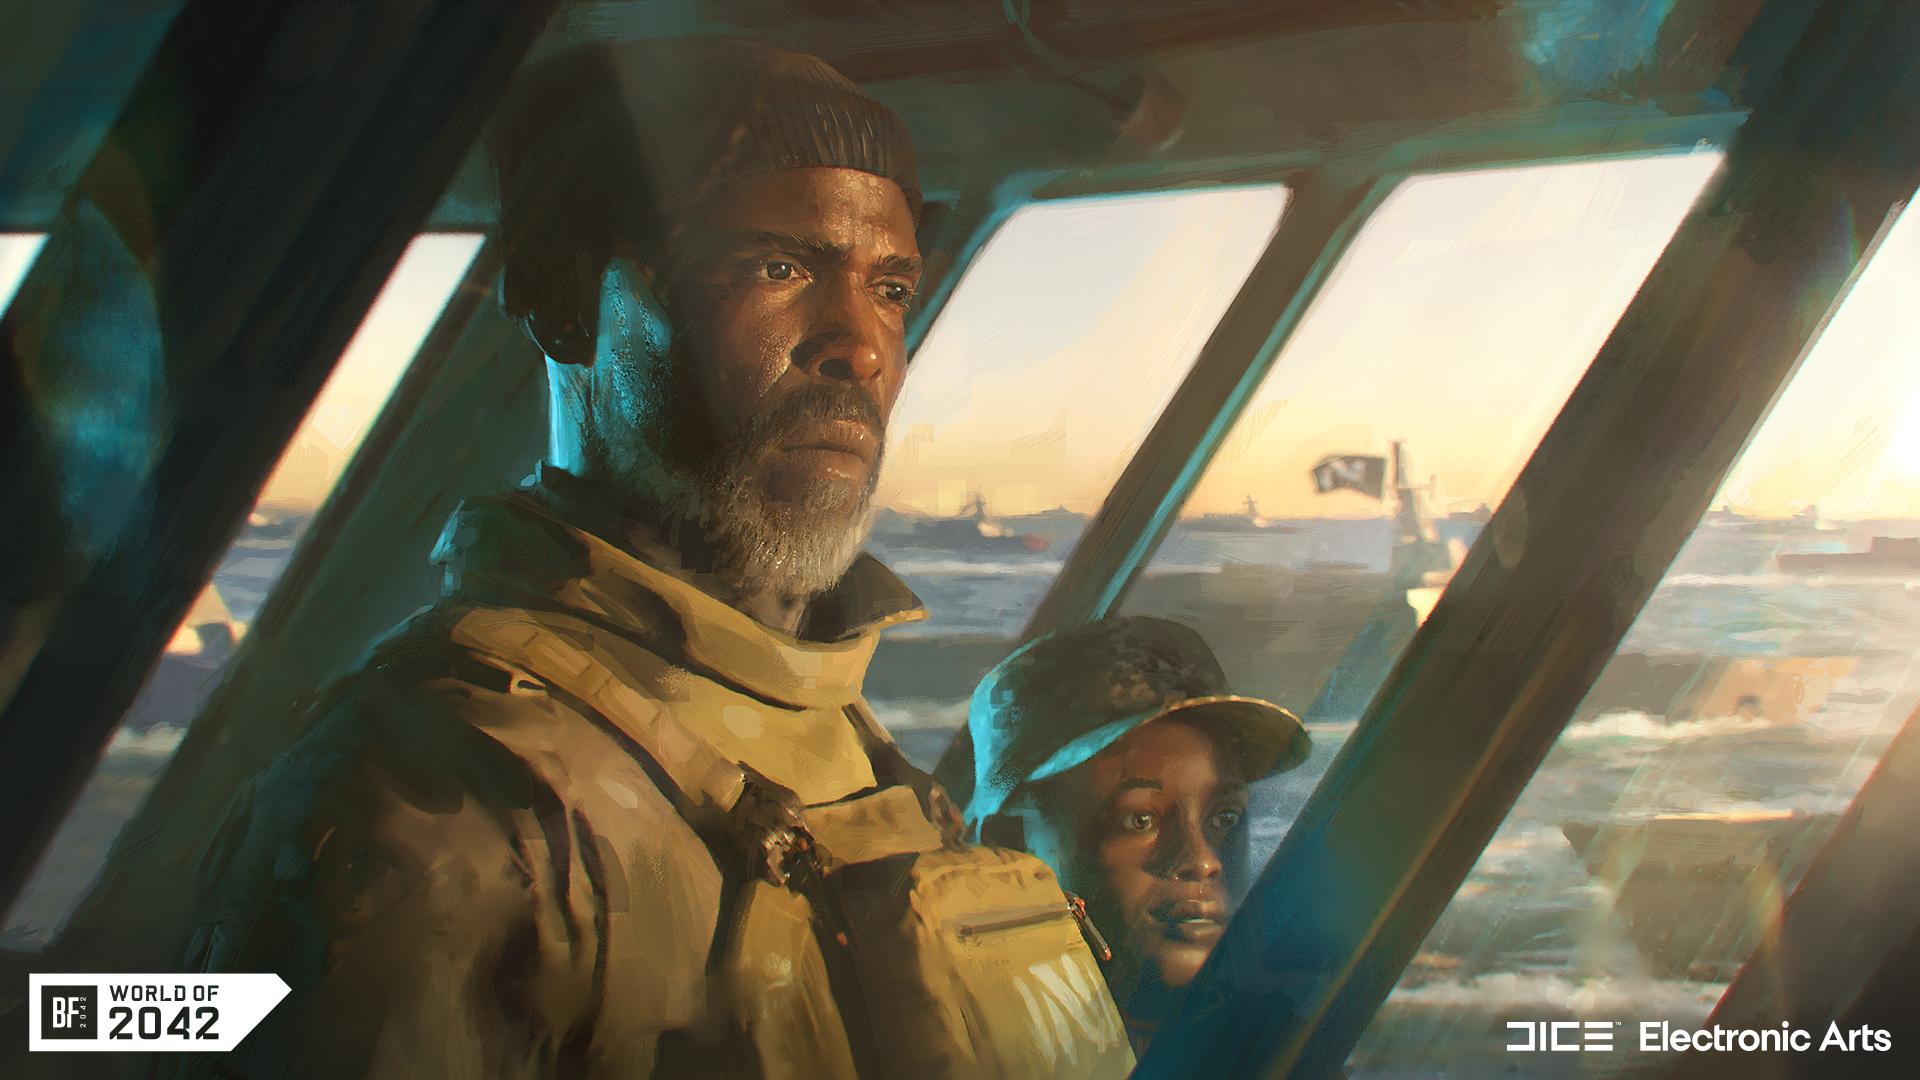 Battlefield Briefing_ The World of 2042 - Exodus 1